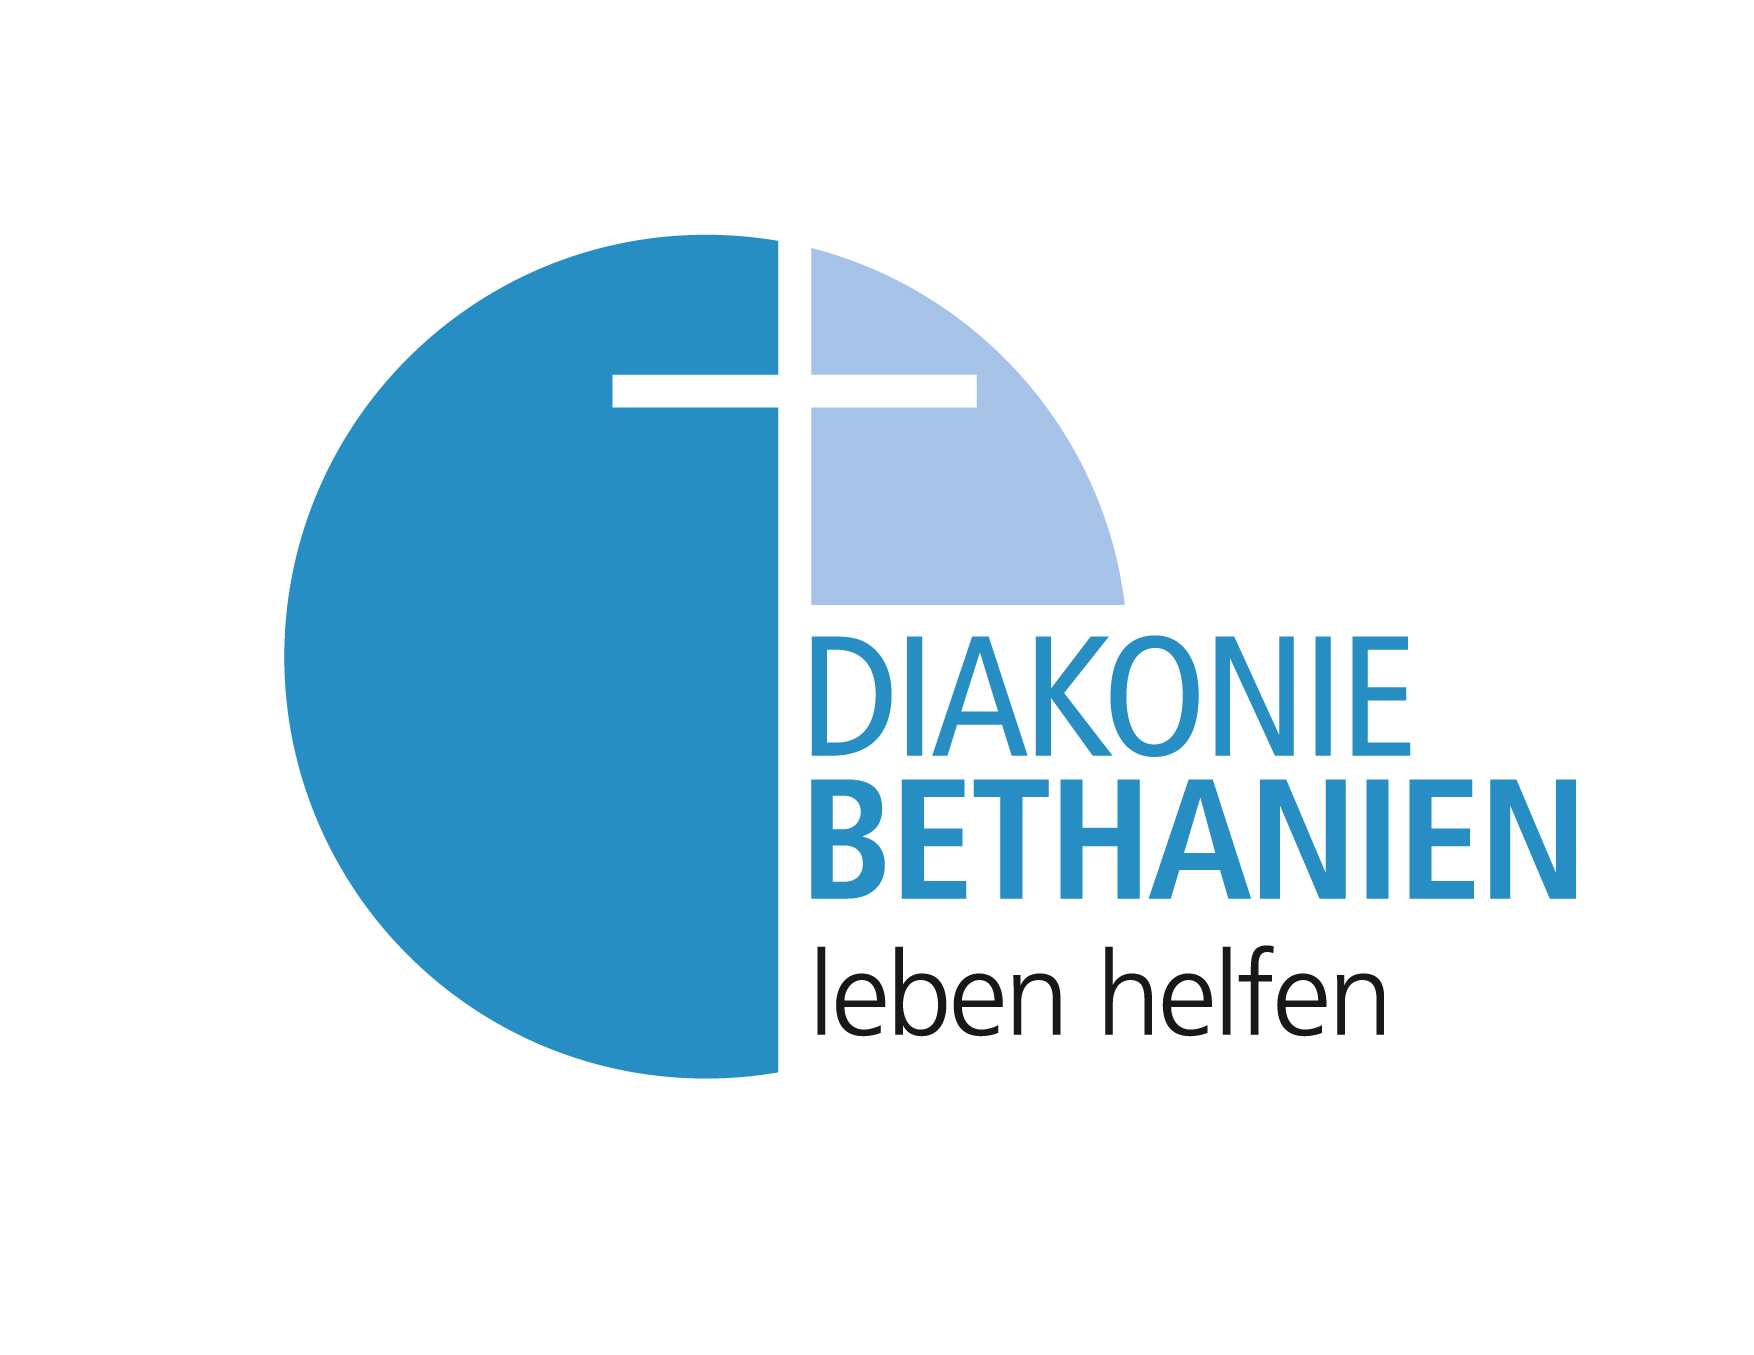 Diakonie_Bethanien